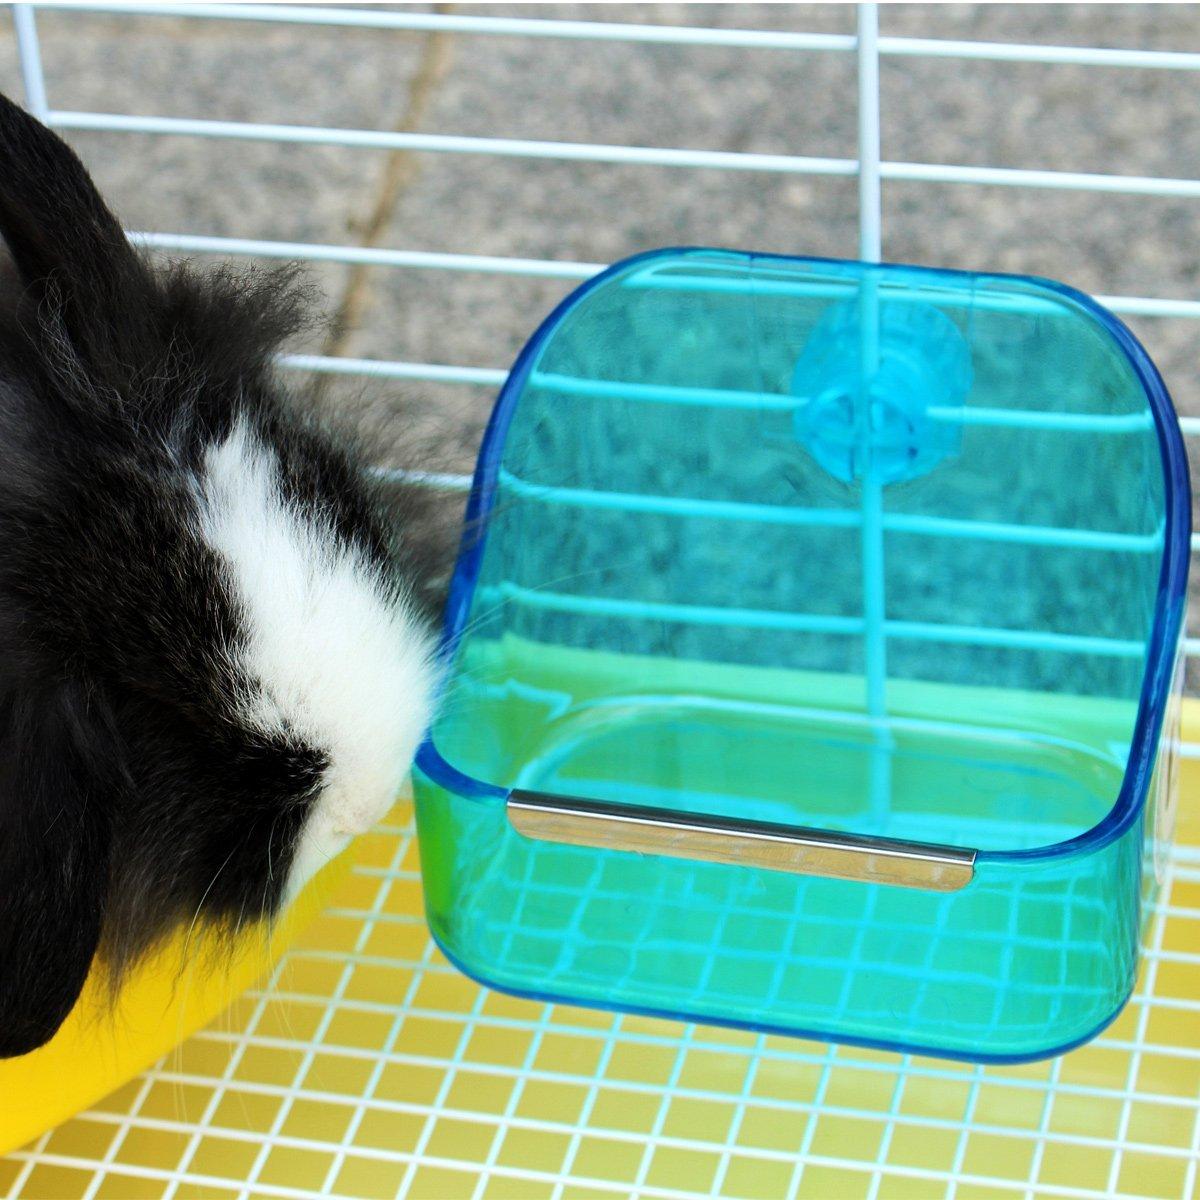 dispenser animal feed hamster random rabbit small com toy guinea cage on rat bowl grass box aliexpress alibaba pig feeder hay carrot holder item color